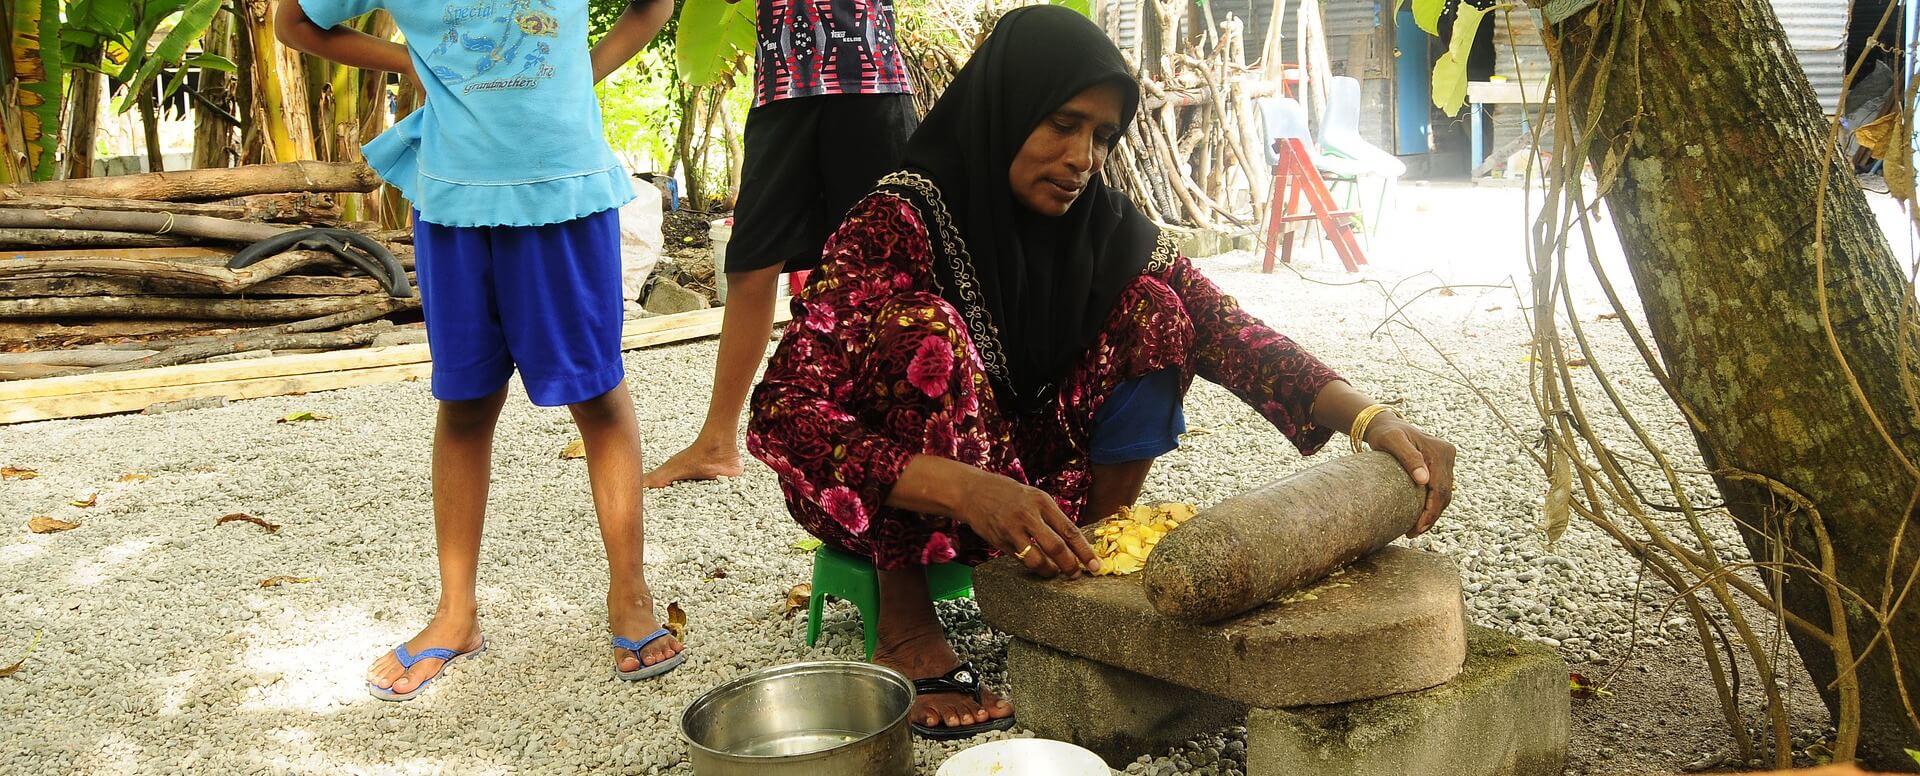 Daily life in the Maldives - Maldives